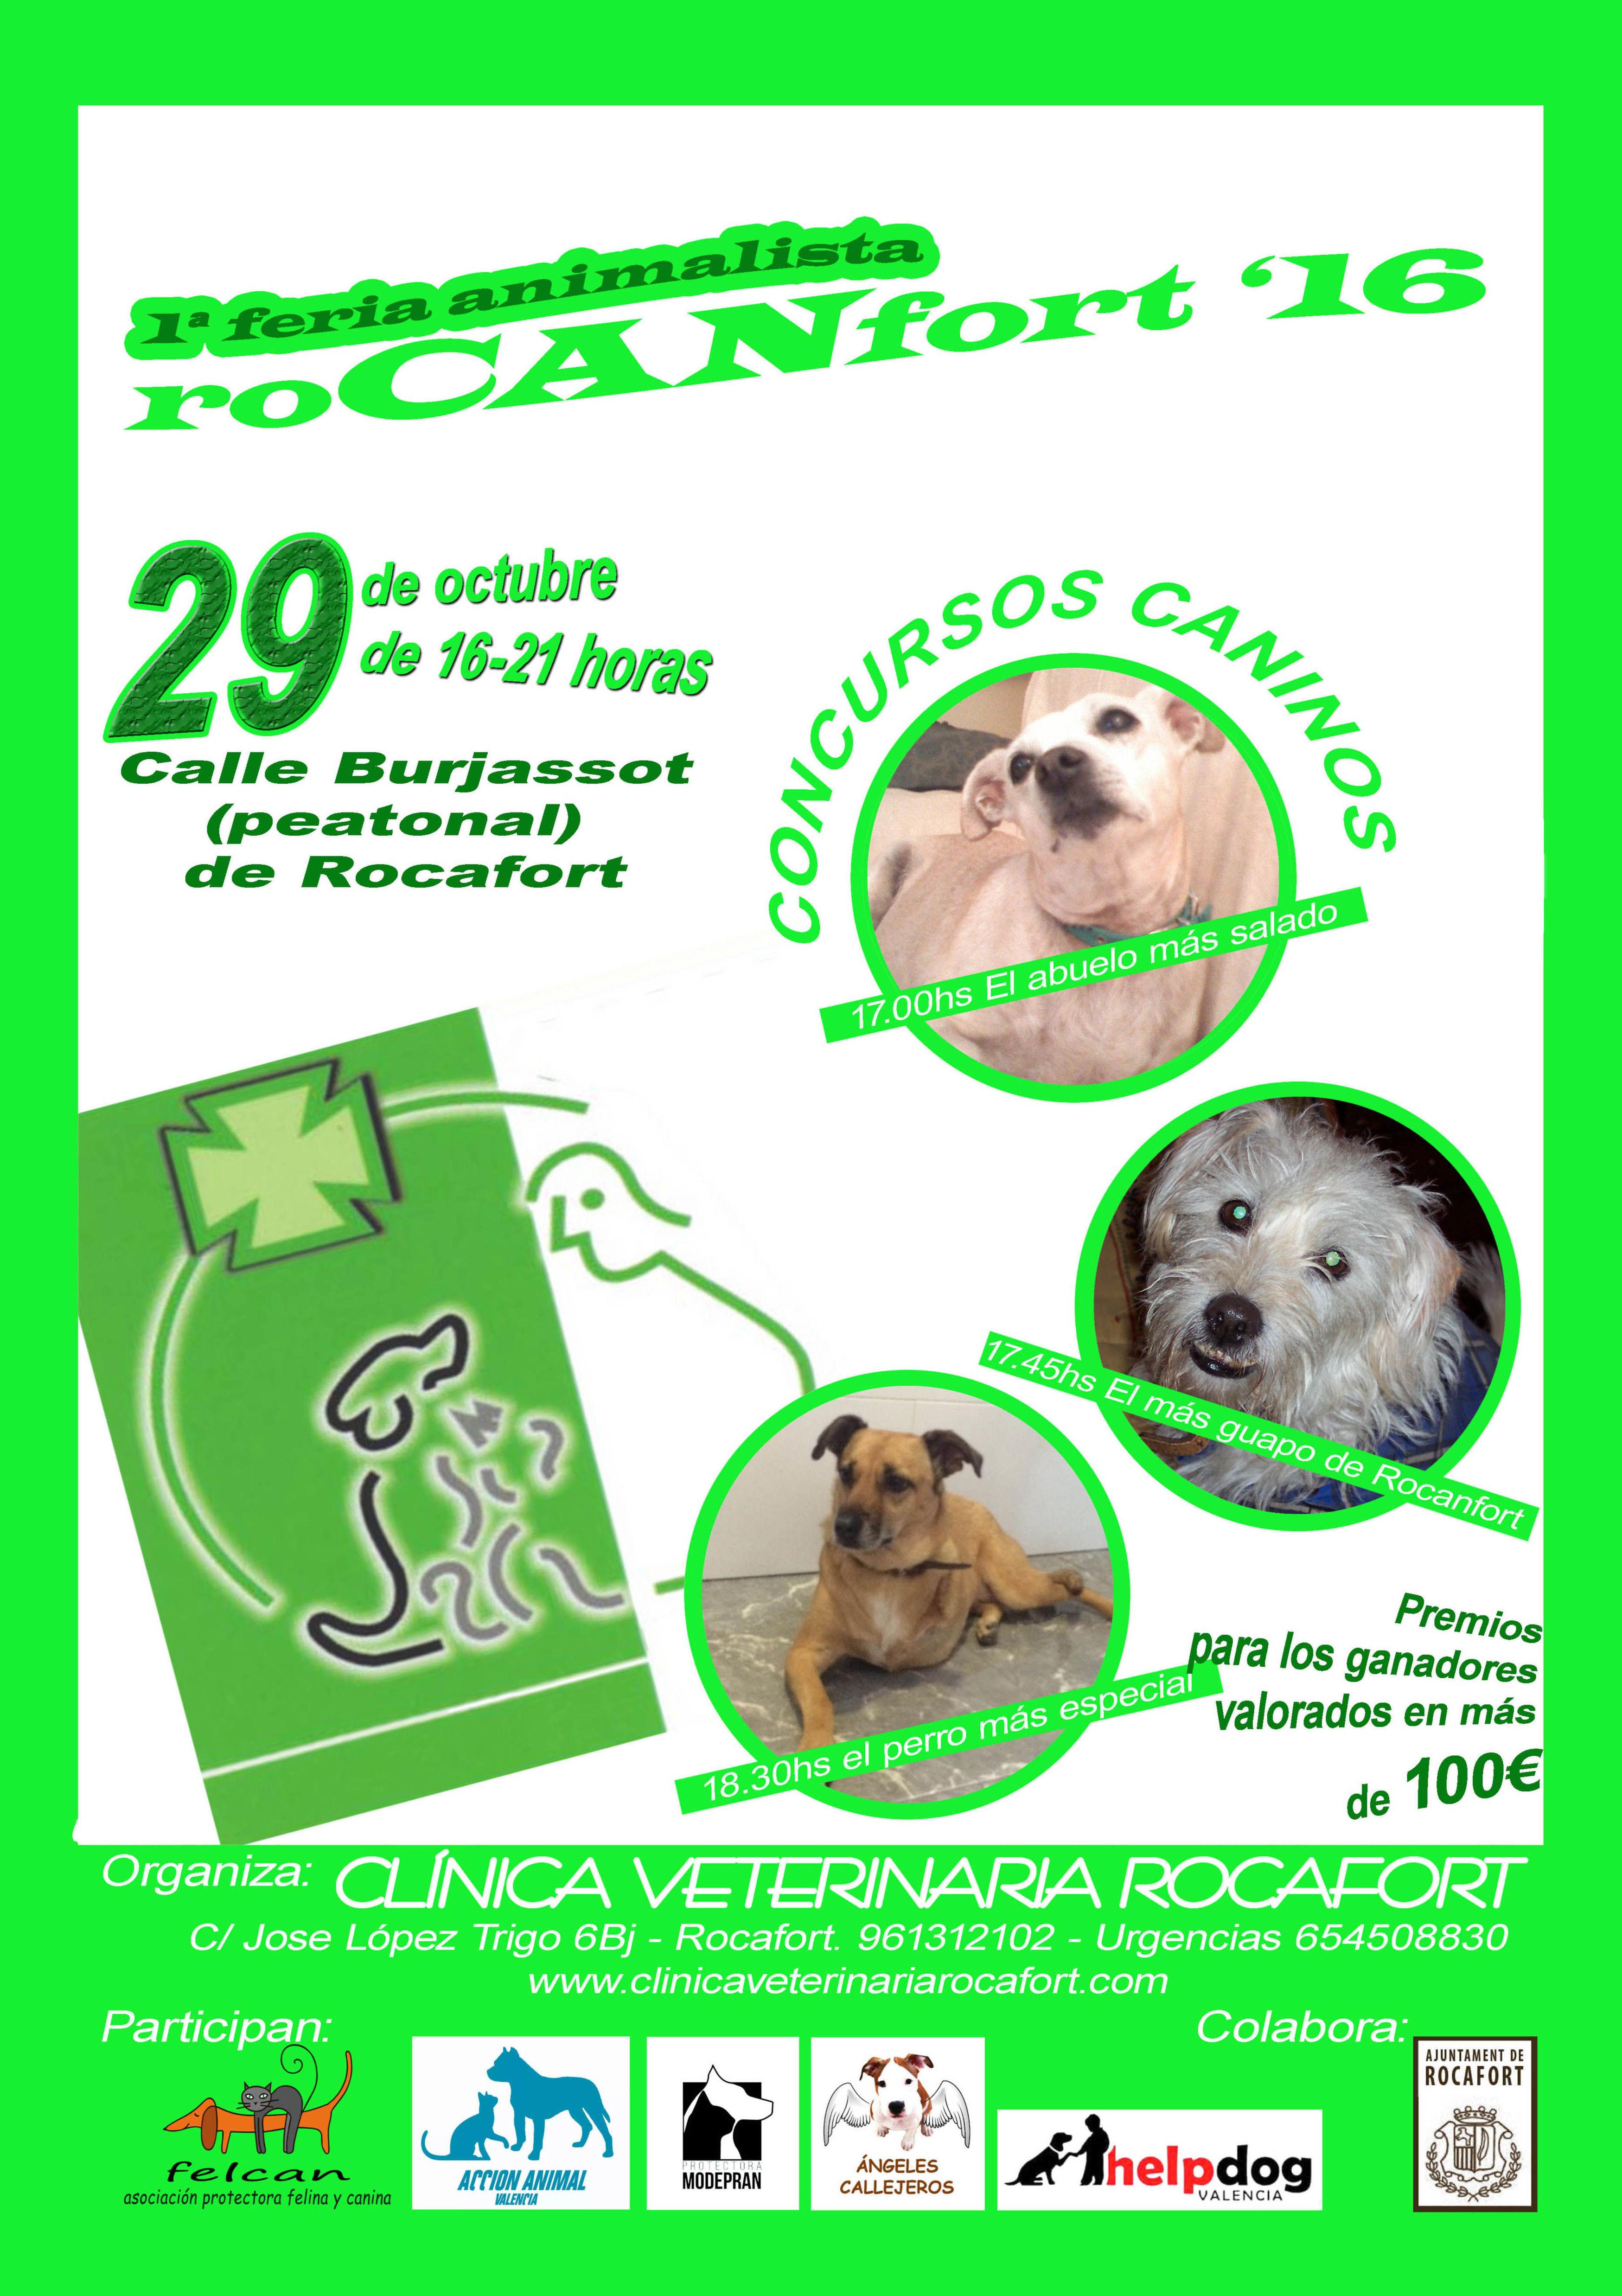 PRIMERA FERIA ANIMALISTA ROCANFORT 2016